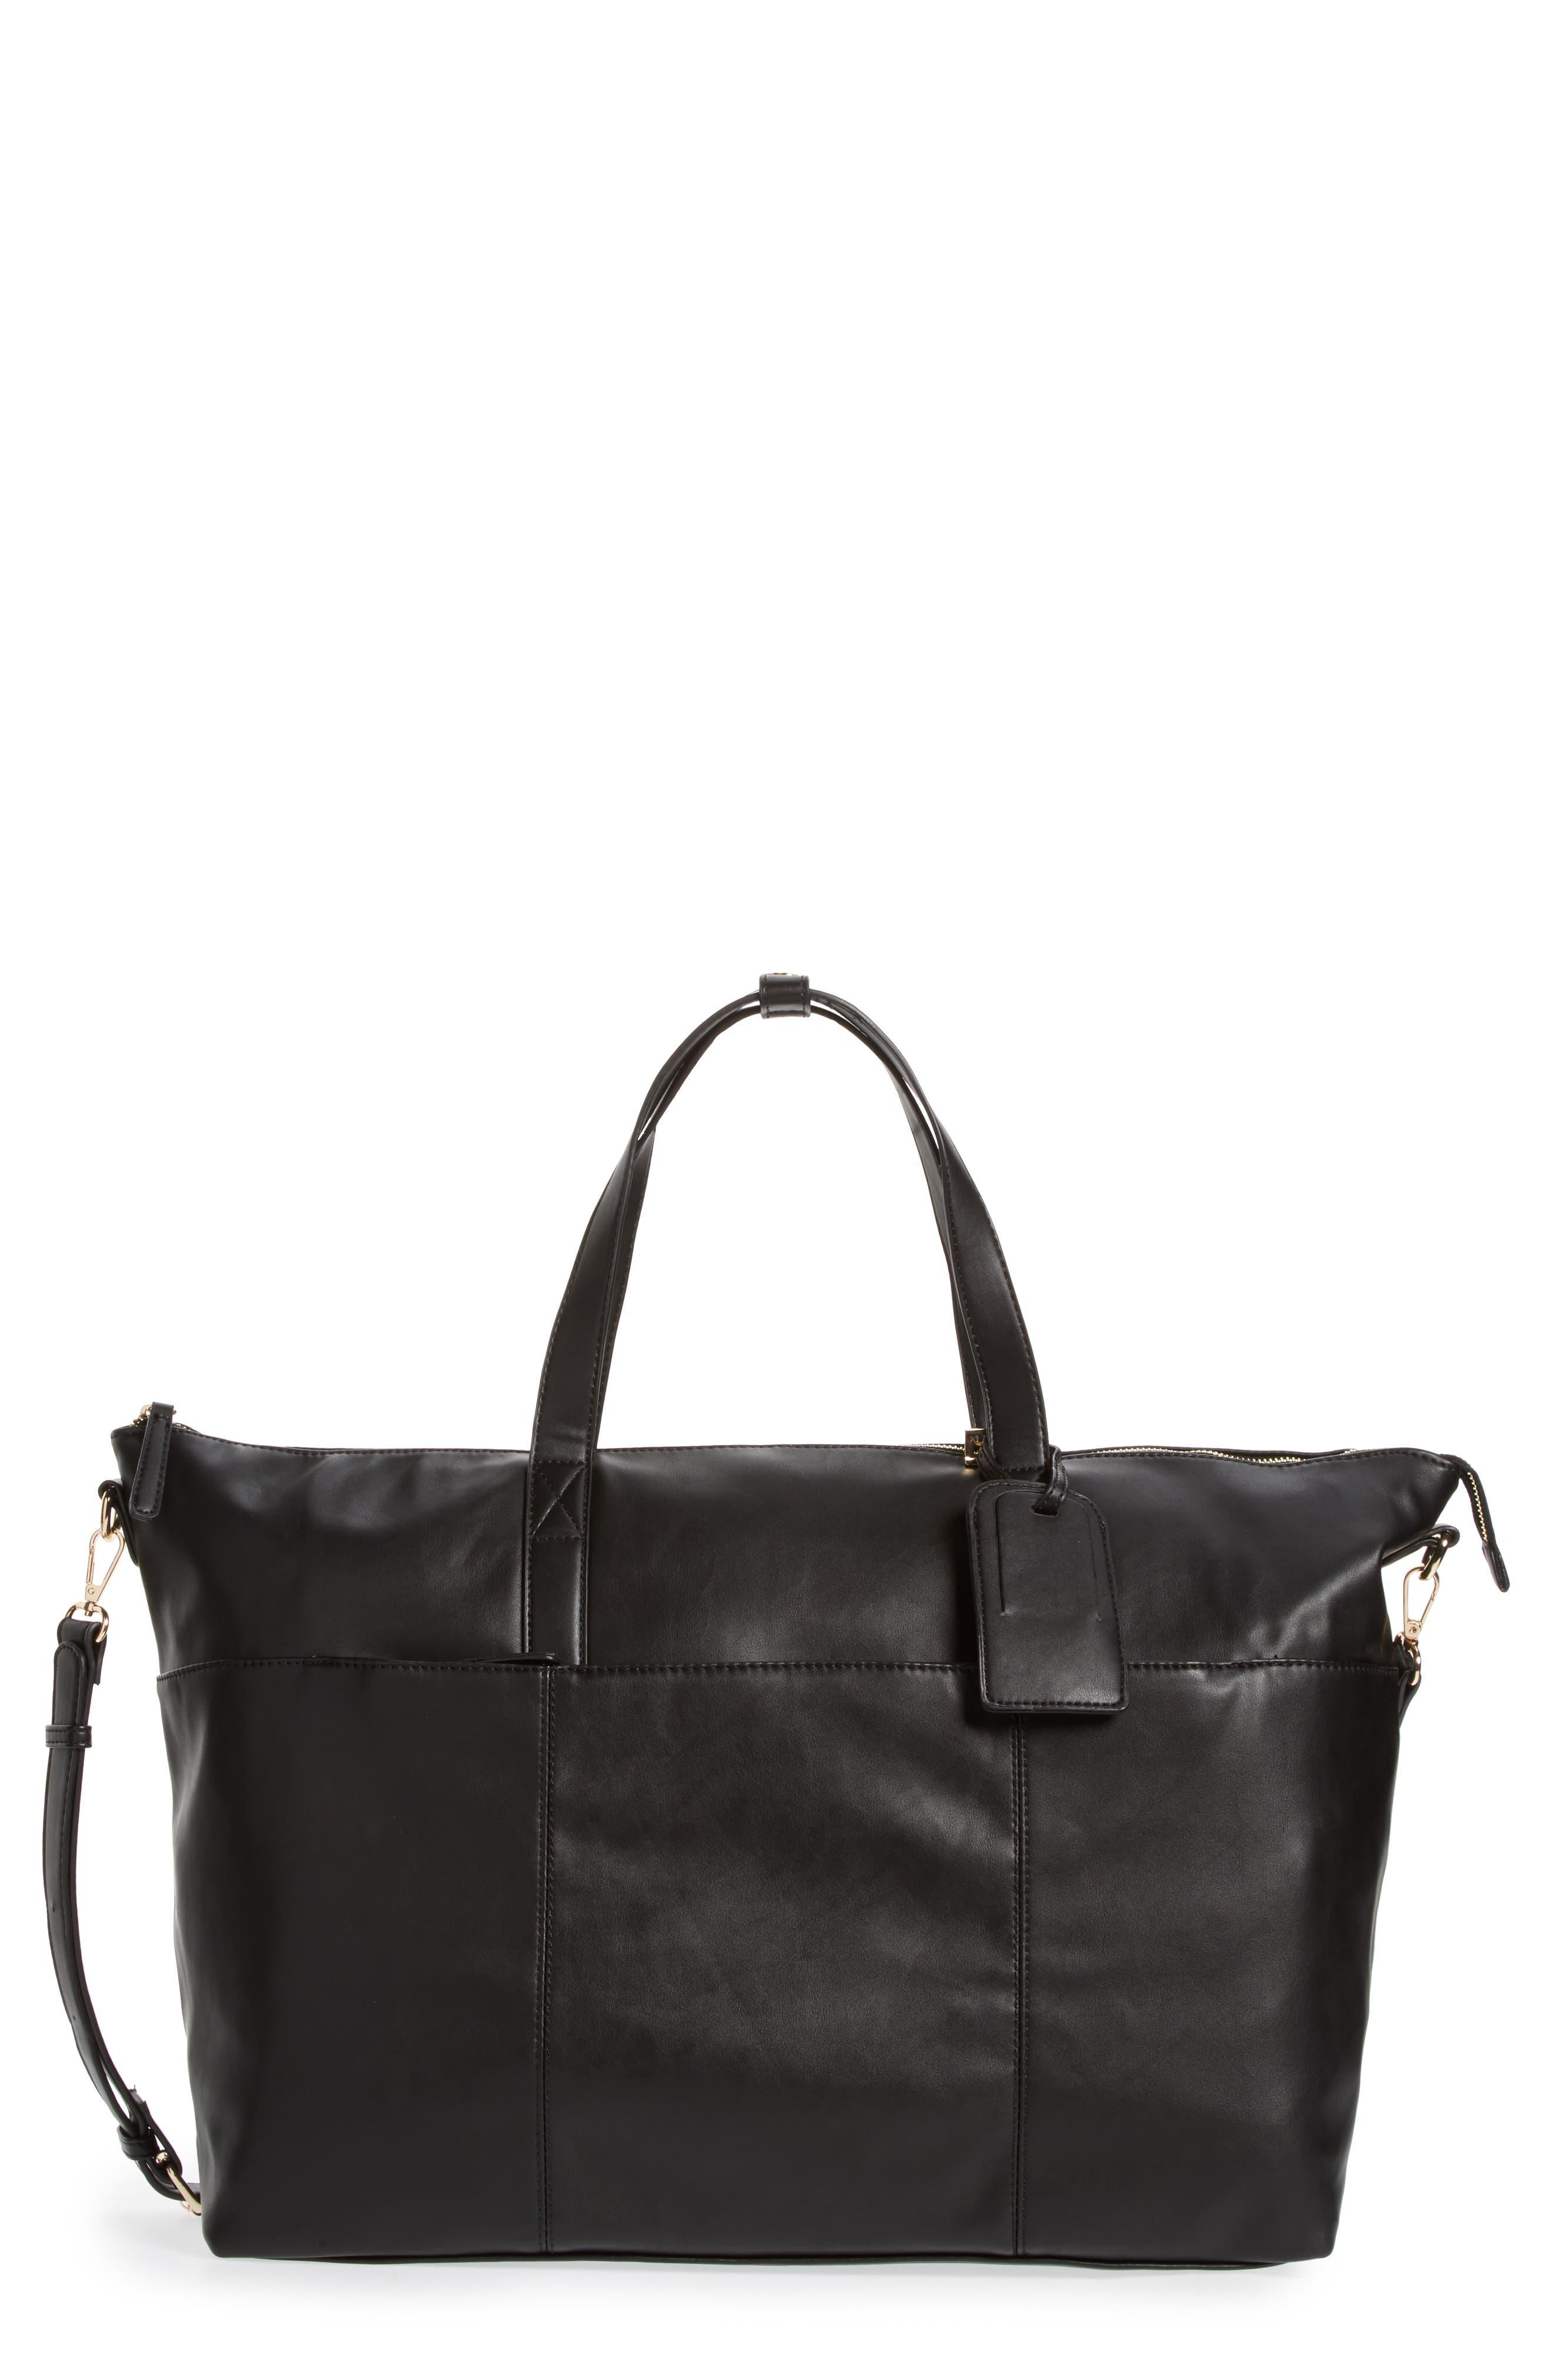 Kelis Duffel Bag,                             Main thumbnail 1, color,                             Black